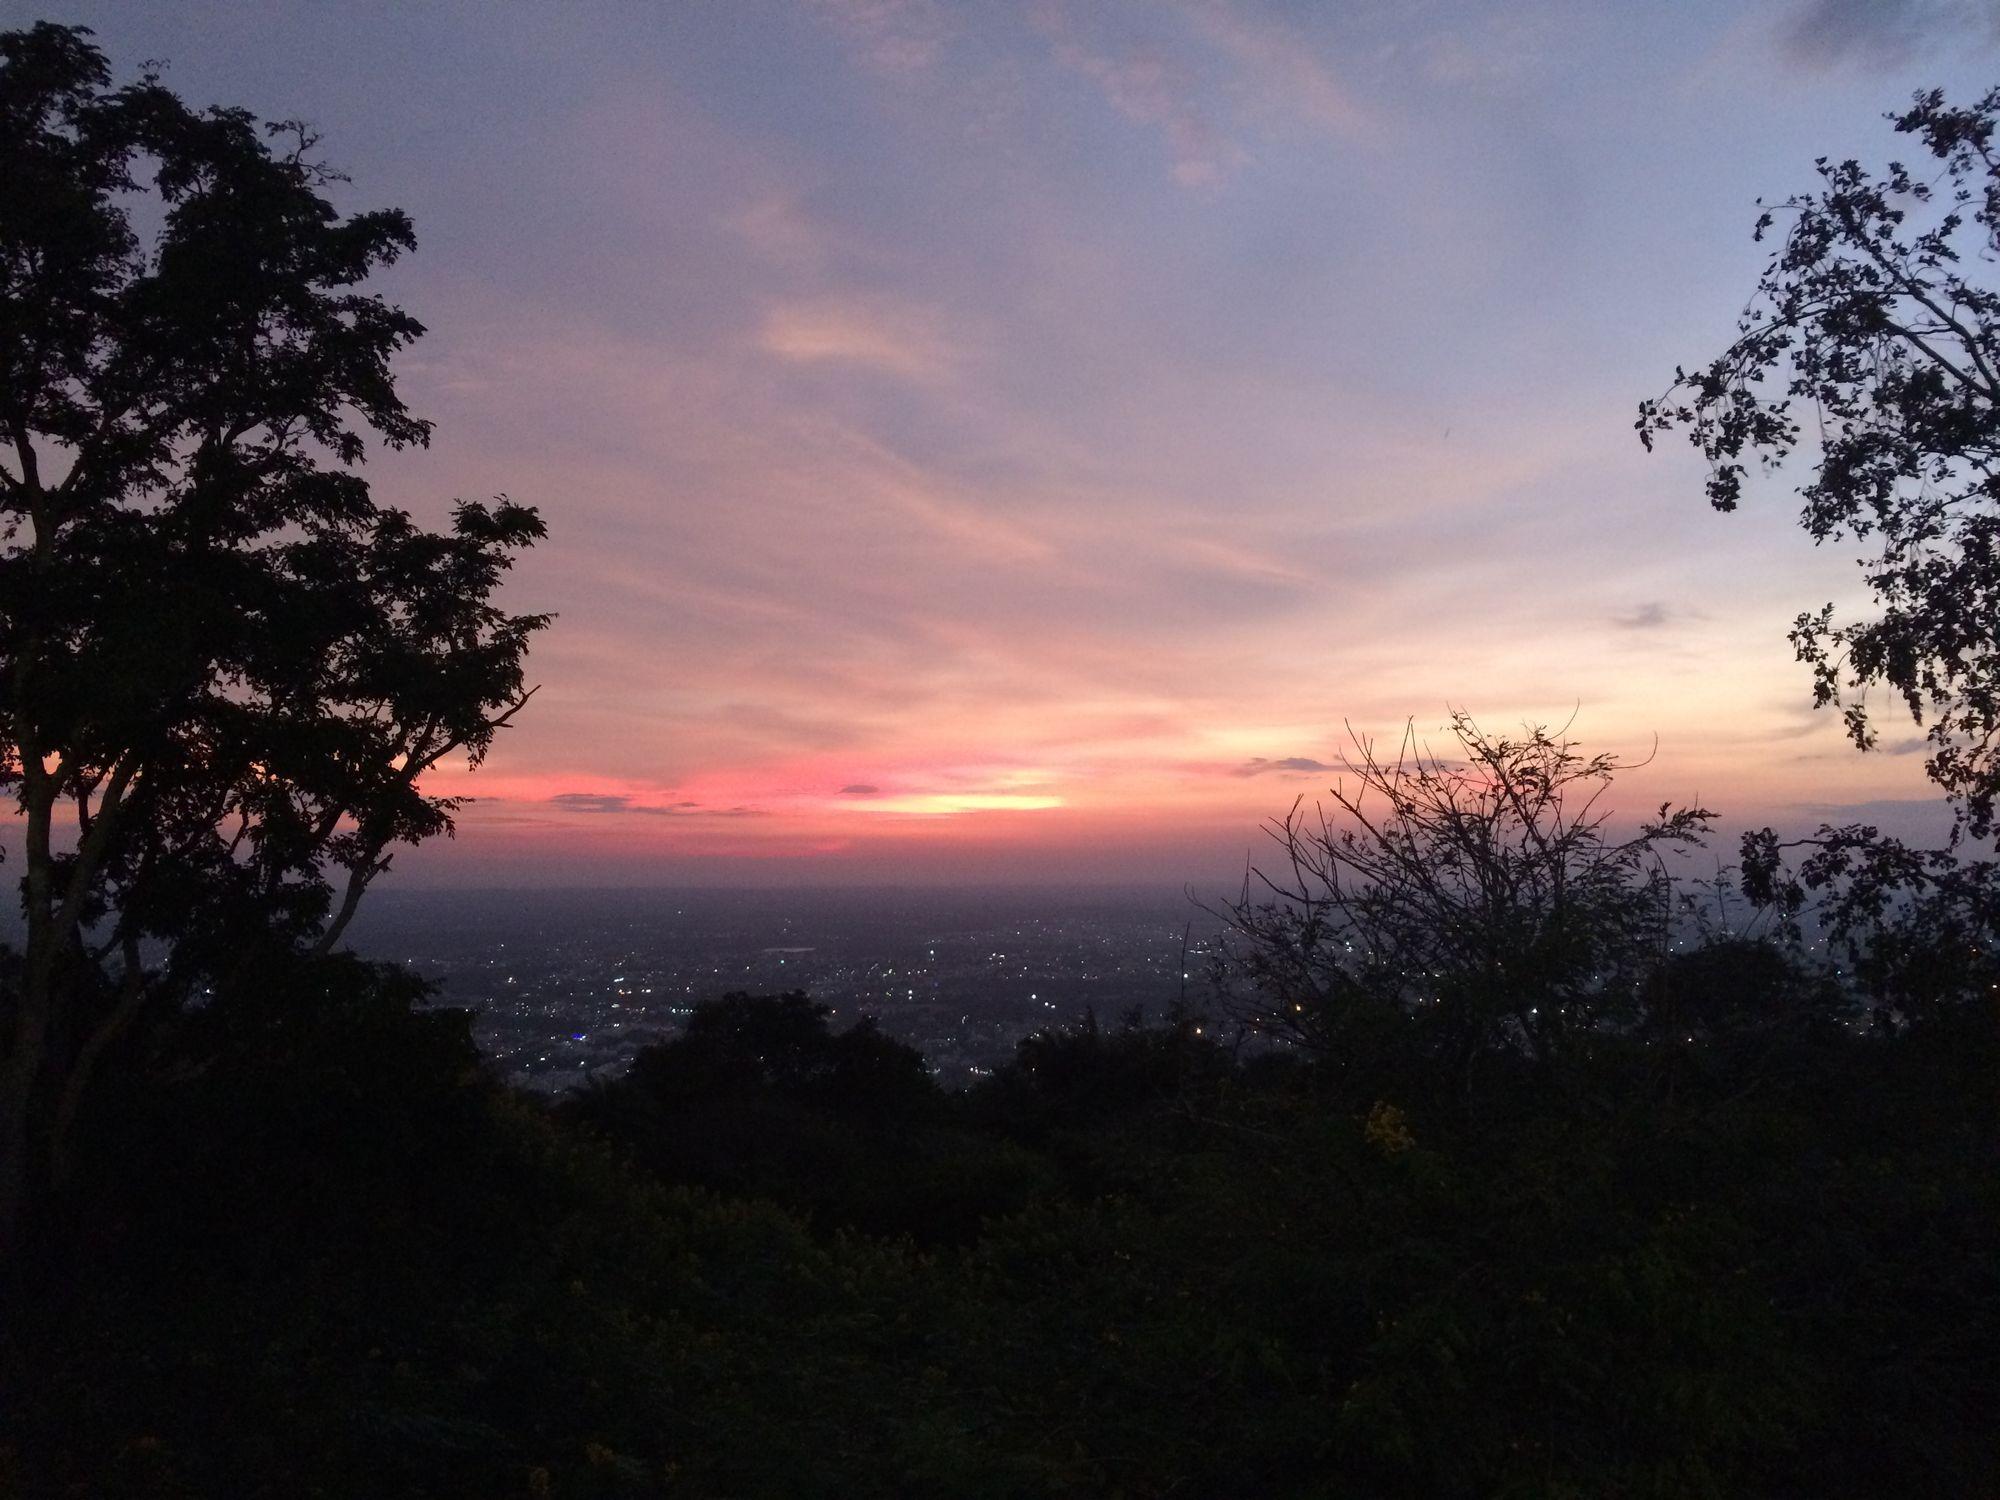 Sunset from Chamundi hills